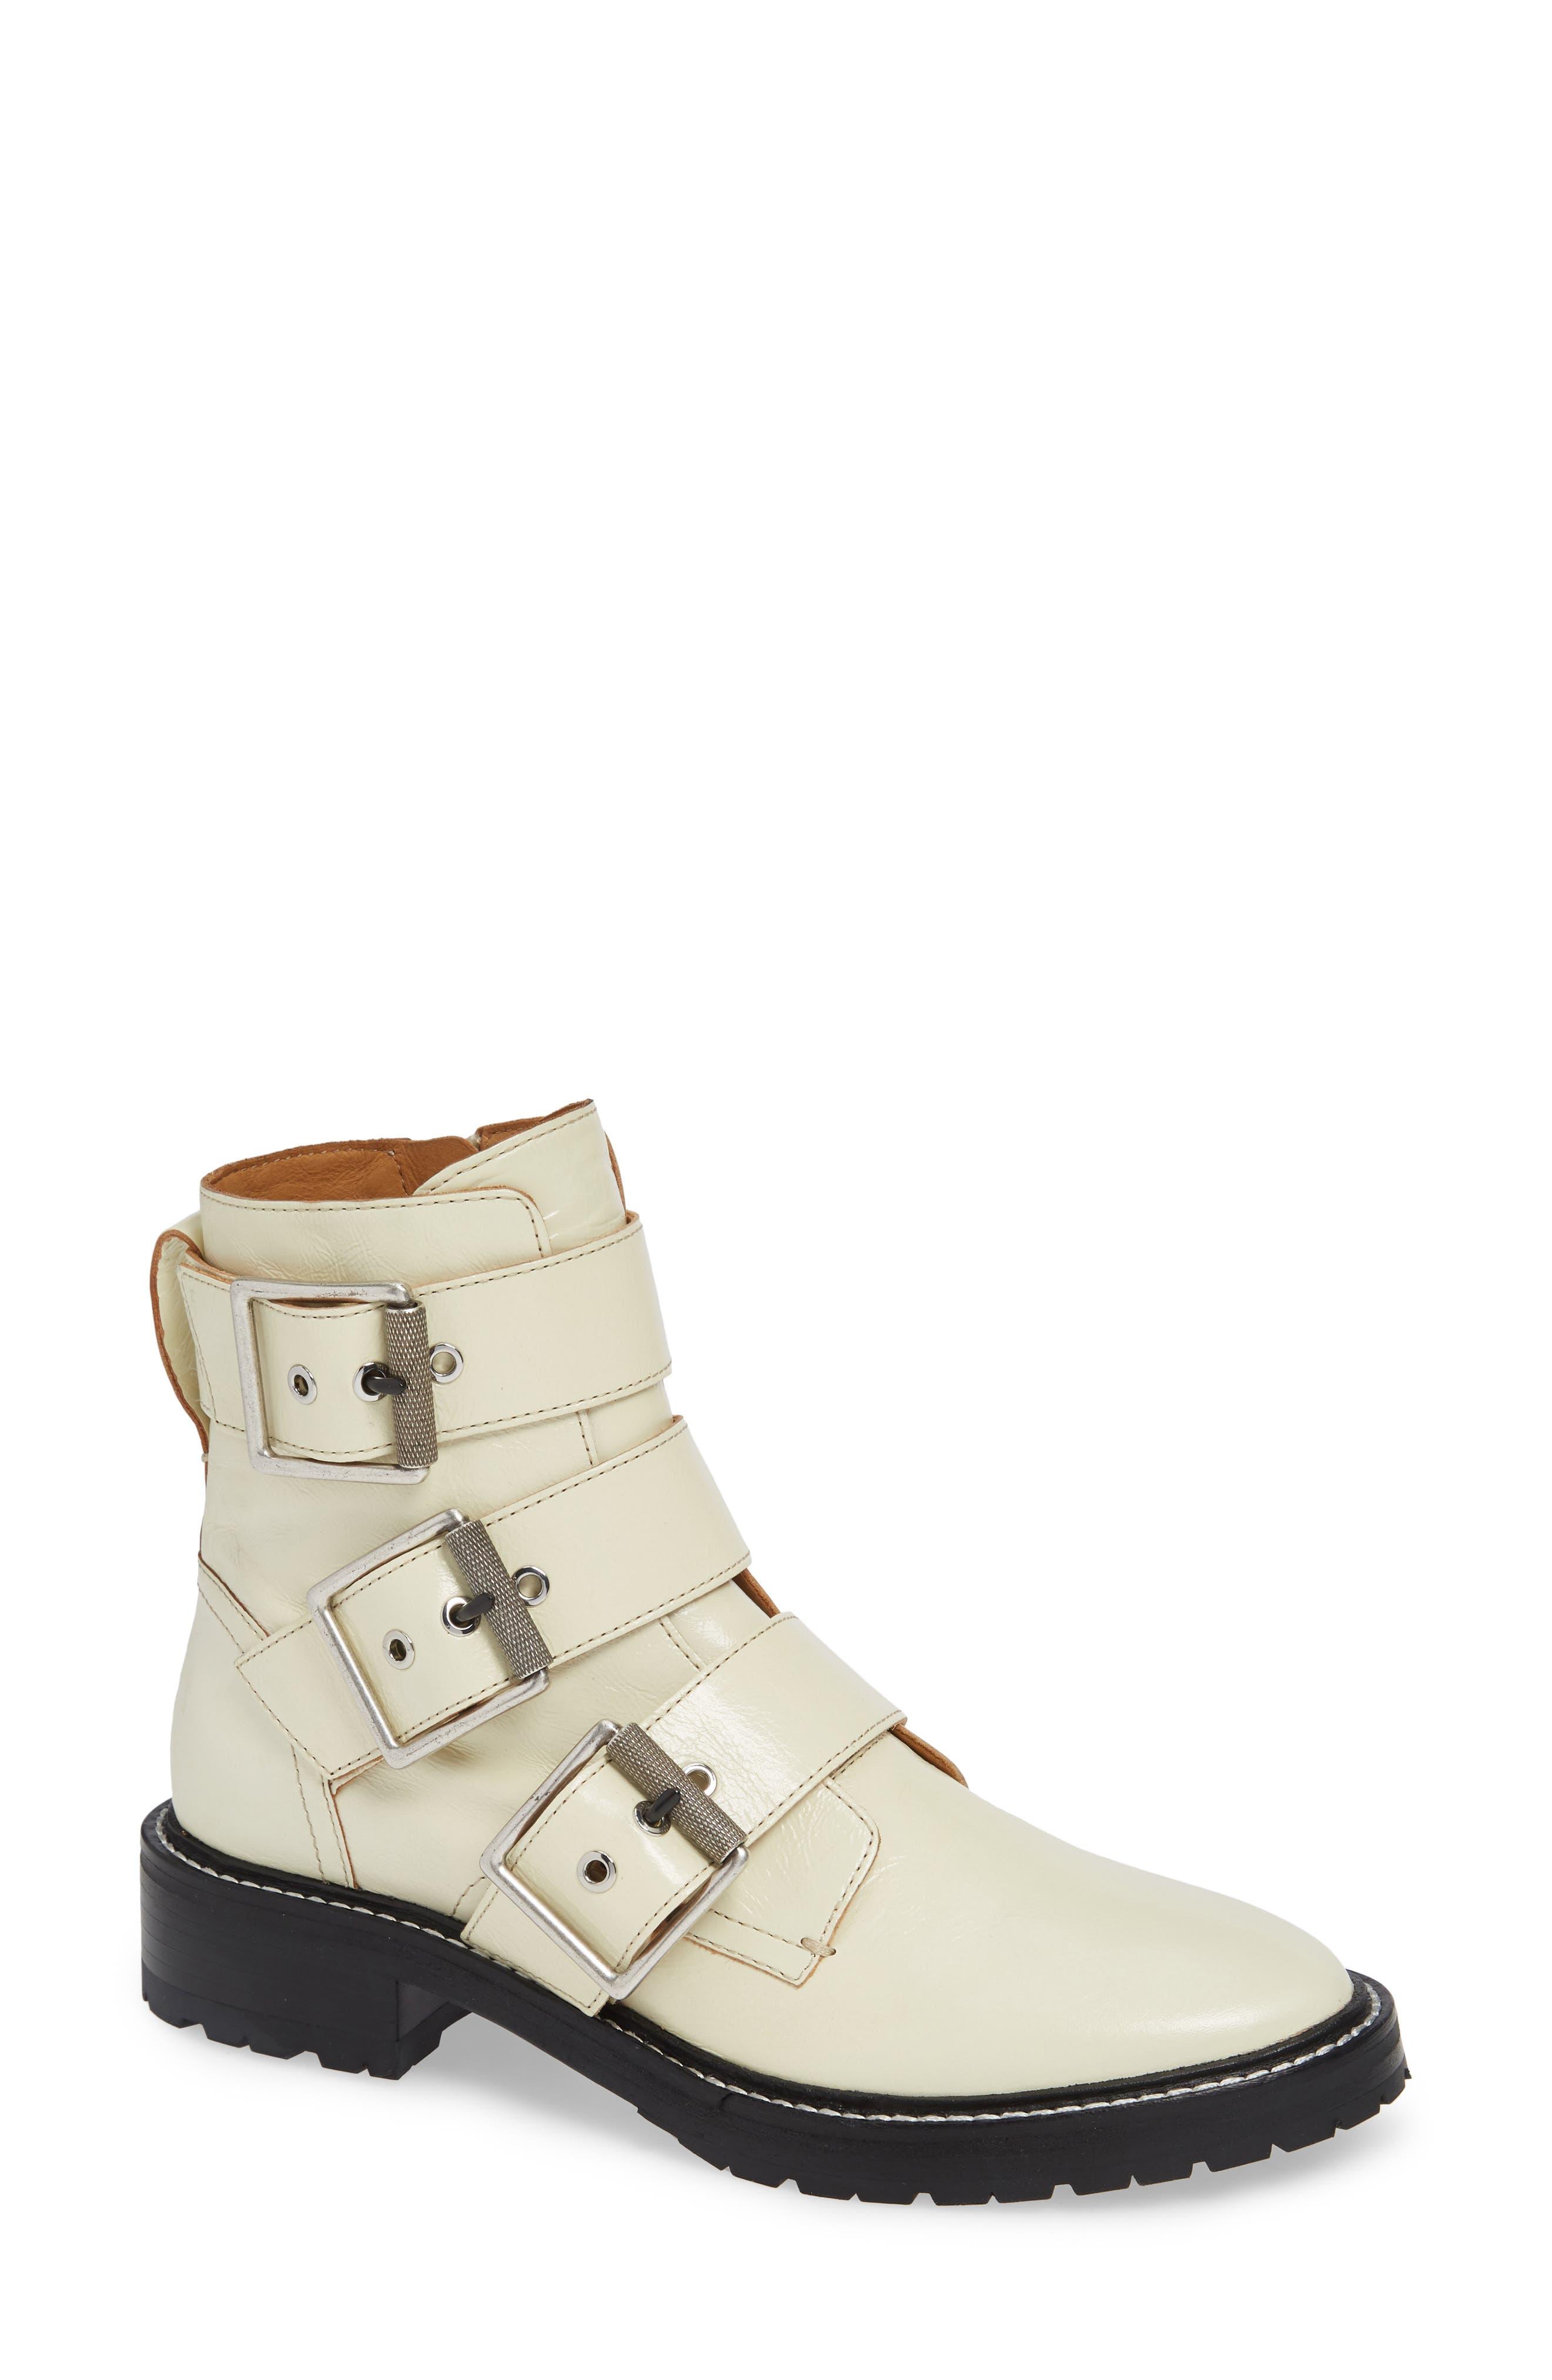 Rag & Bone Cannon Buckle Moto Boot, White